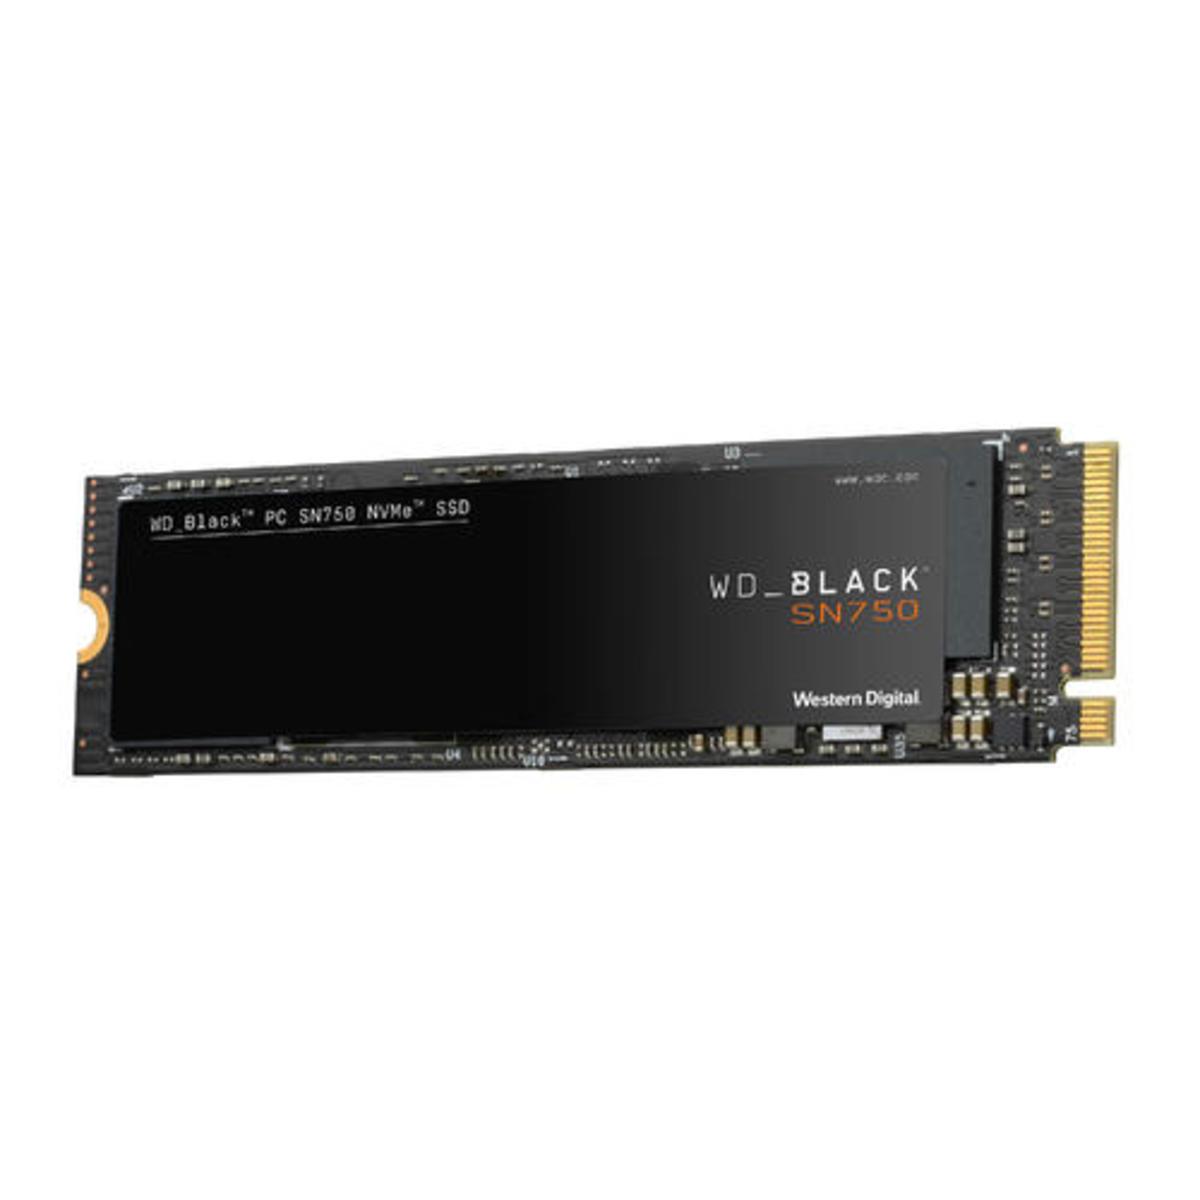 WD 1TB BLACK SN750 NVME SSD 內置固體硬碟 (WDS100T3X0C)